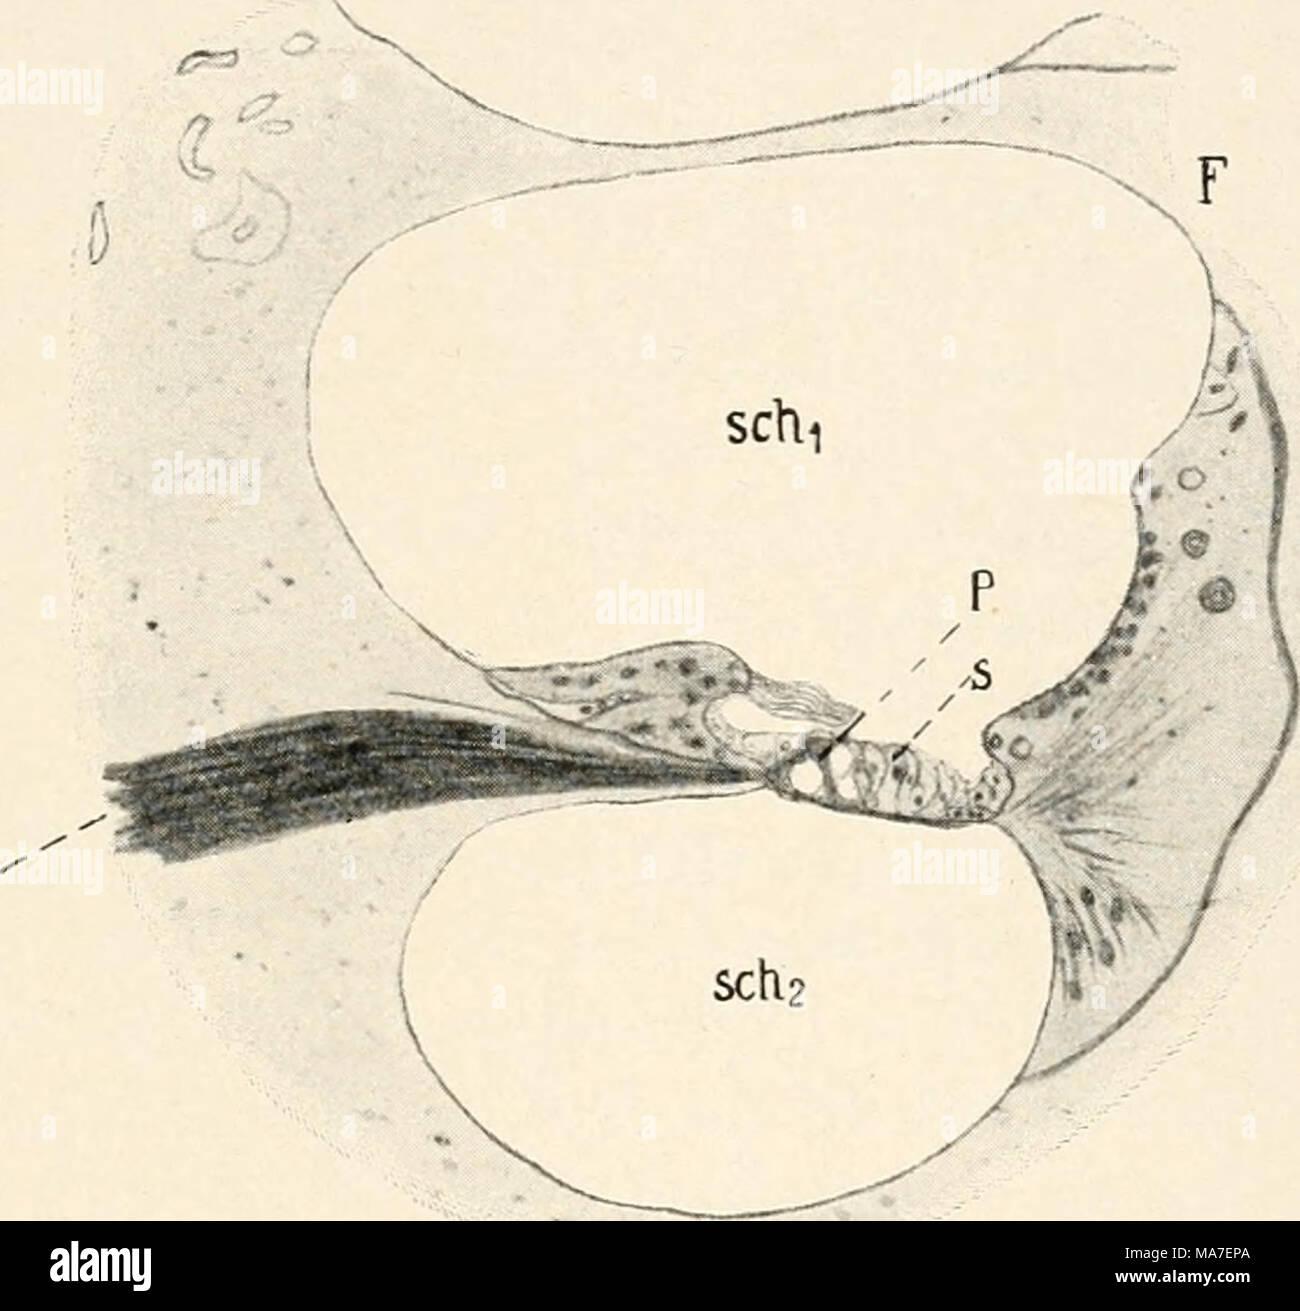 Groß Gehirn Schnittsanatomie Fotos - Anatomie Ideen - finotti.info